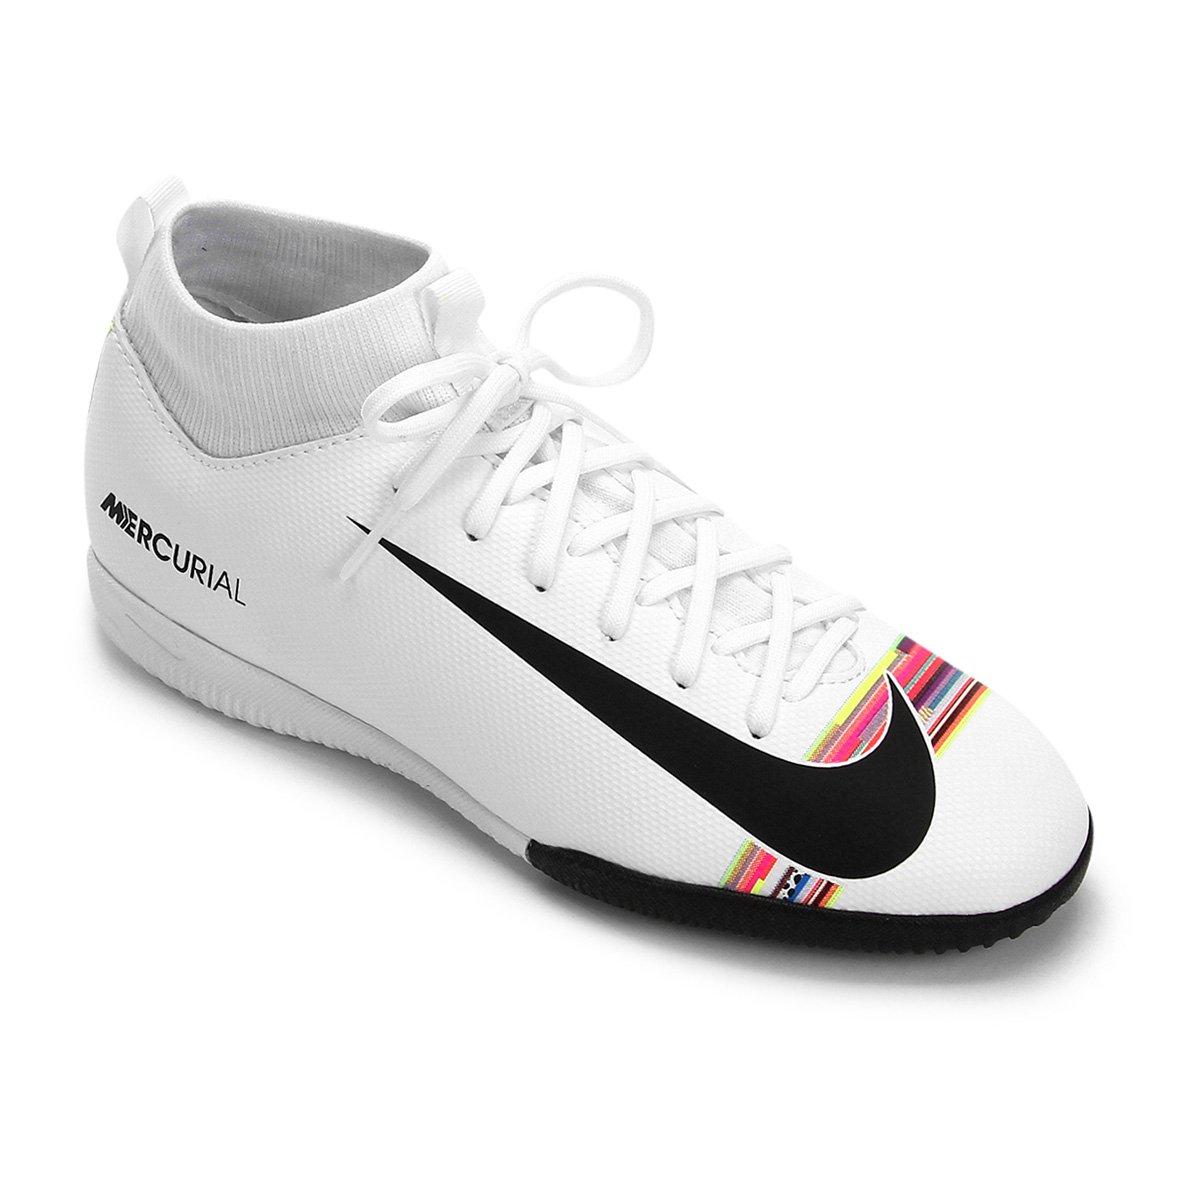 4df7970609 Chuteira Futsal Infantil Nike Mercurial Superfly 6 Academy GS CR7 IC -  Branco e Preto